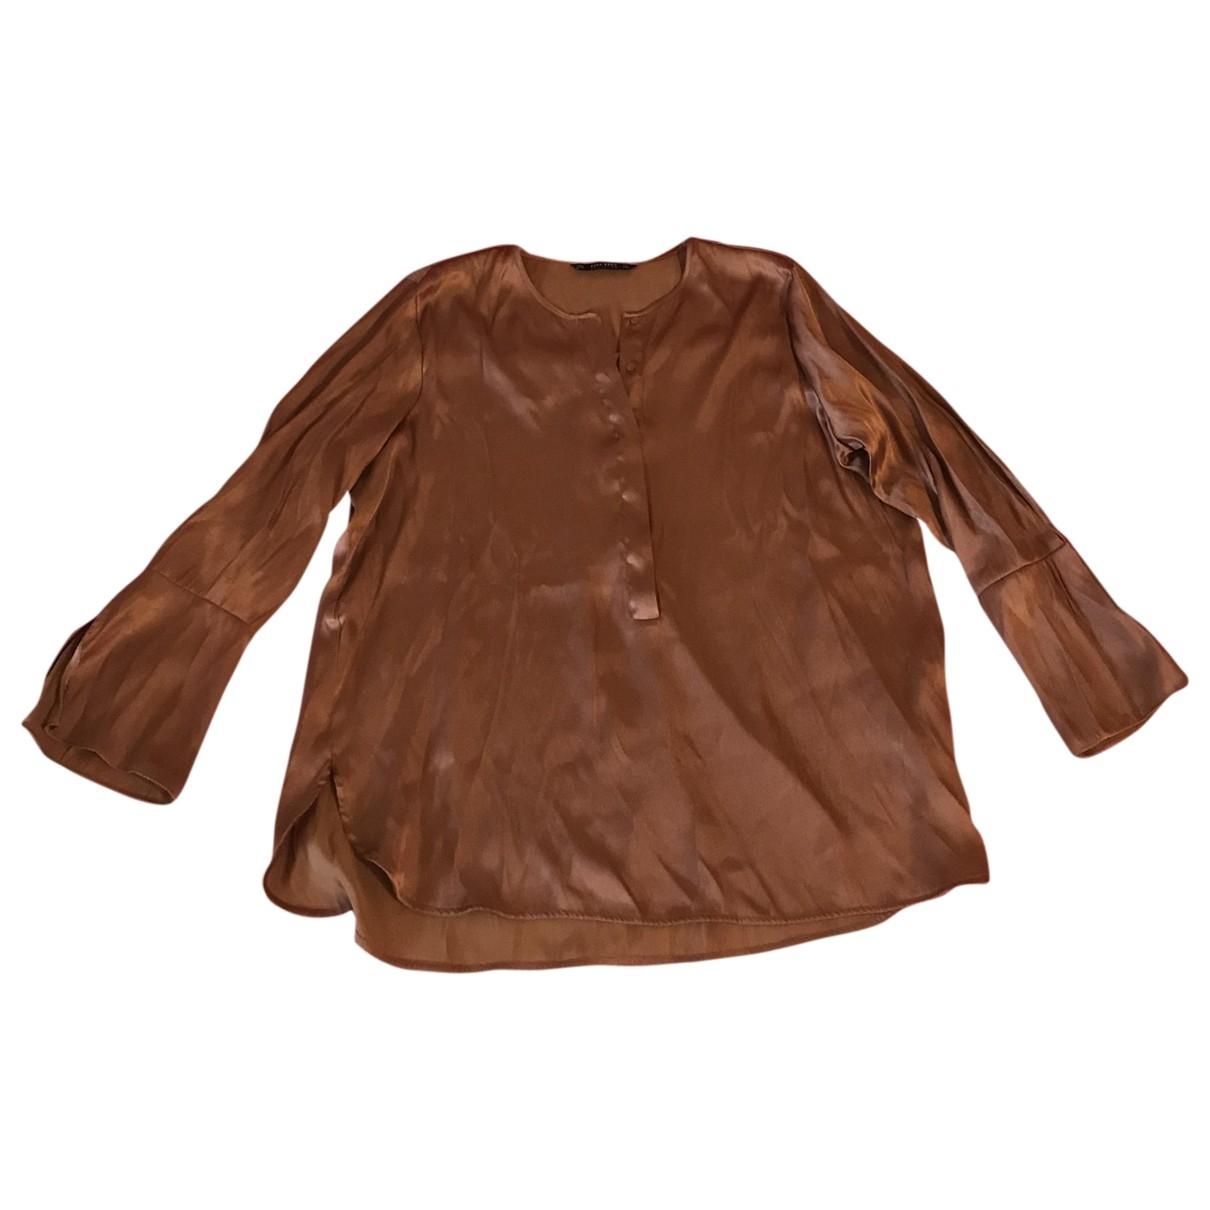 Zara \N Top in  Braun Synthetik